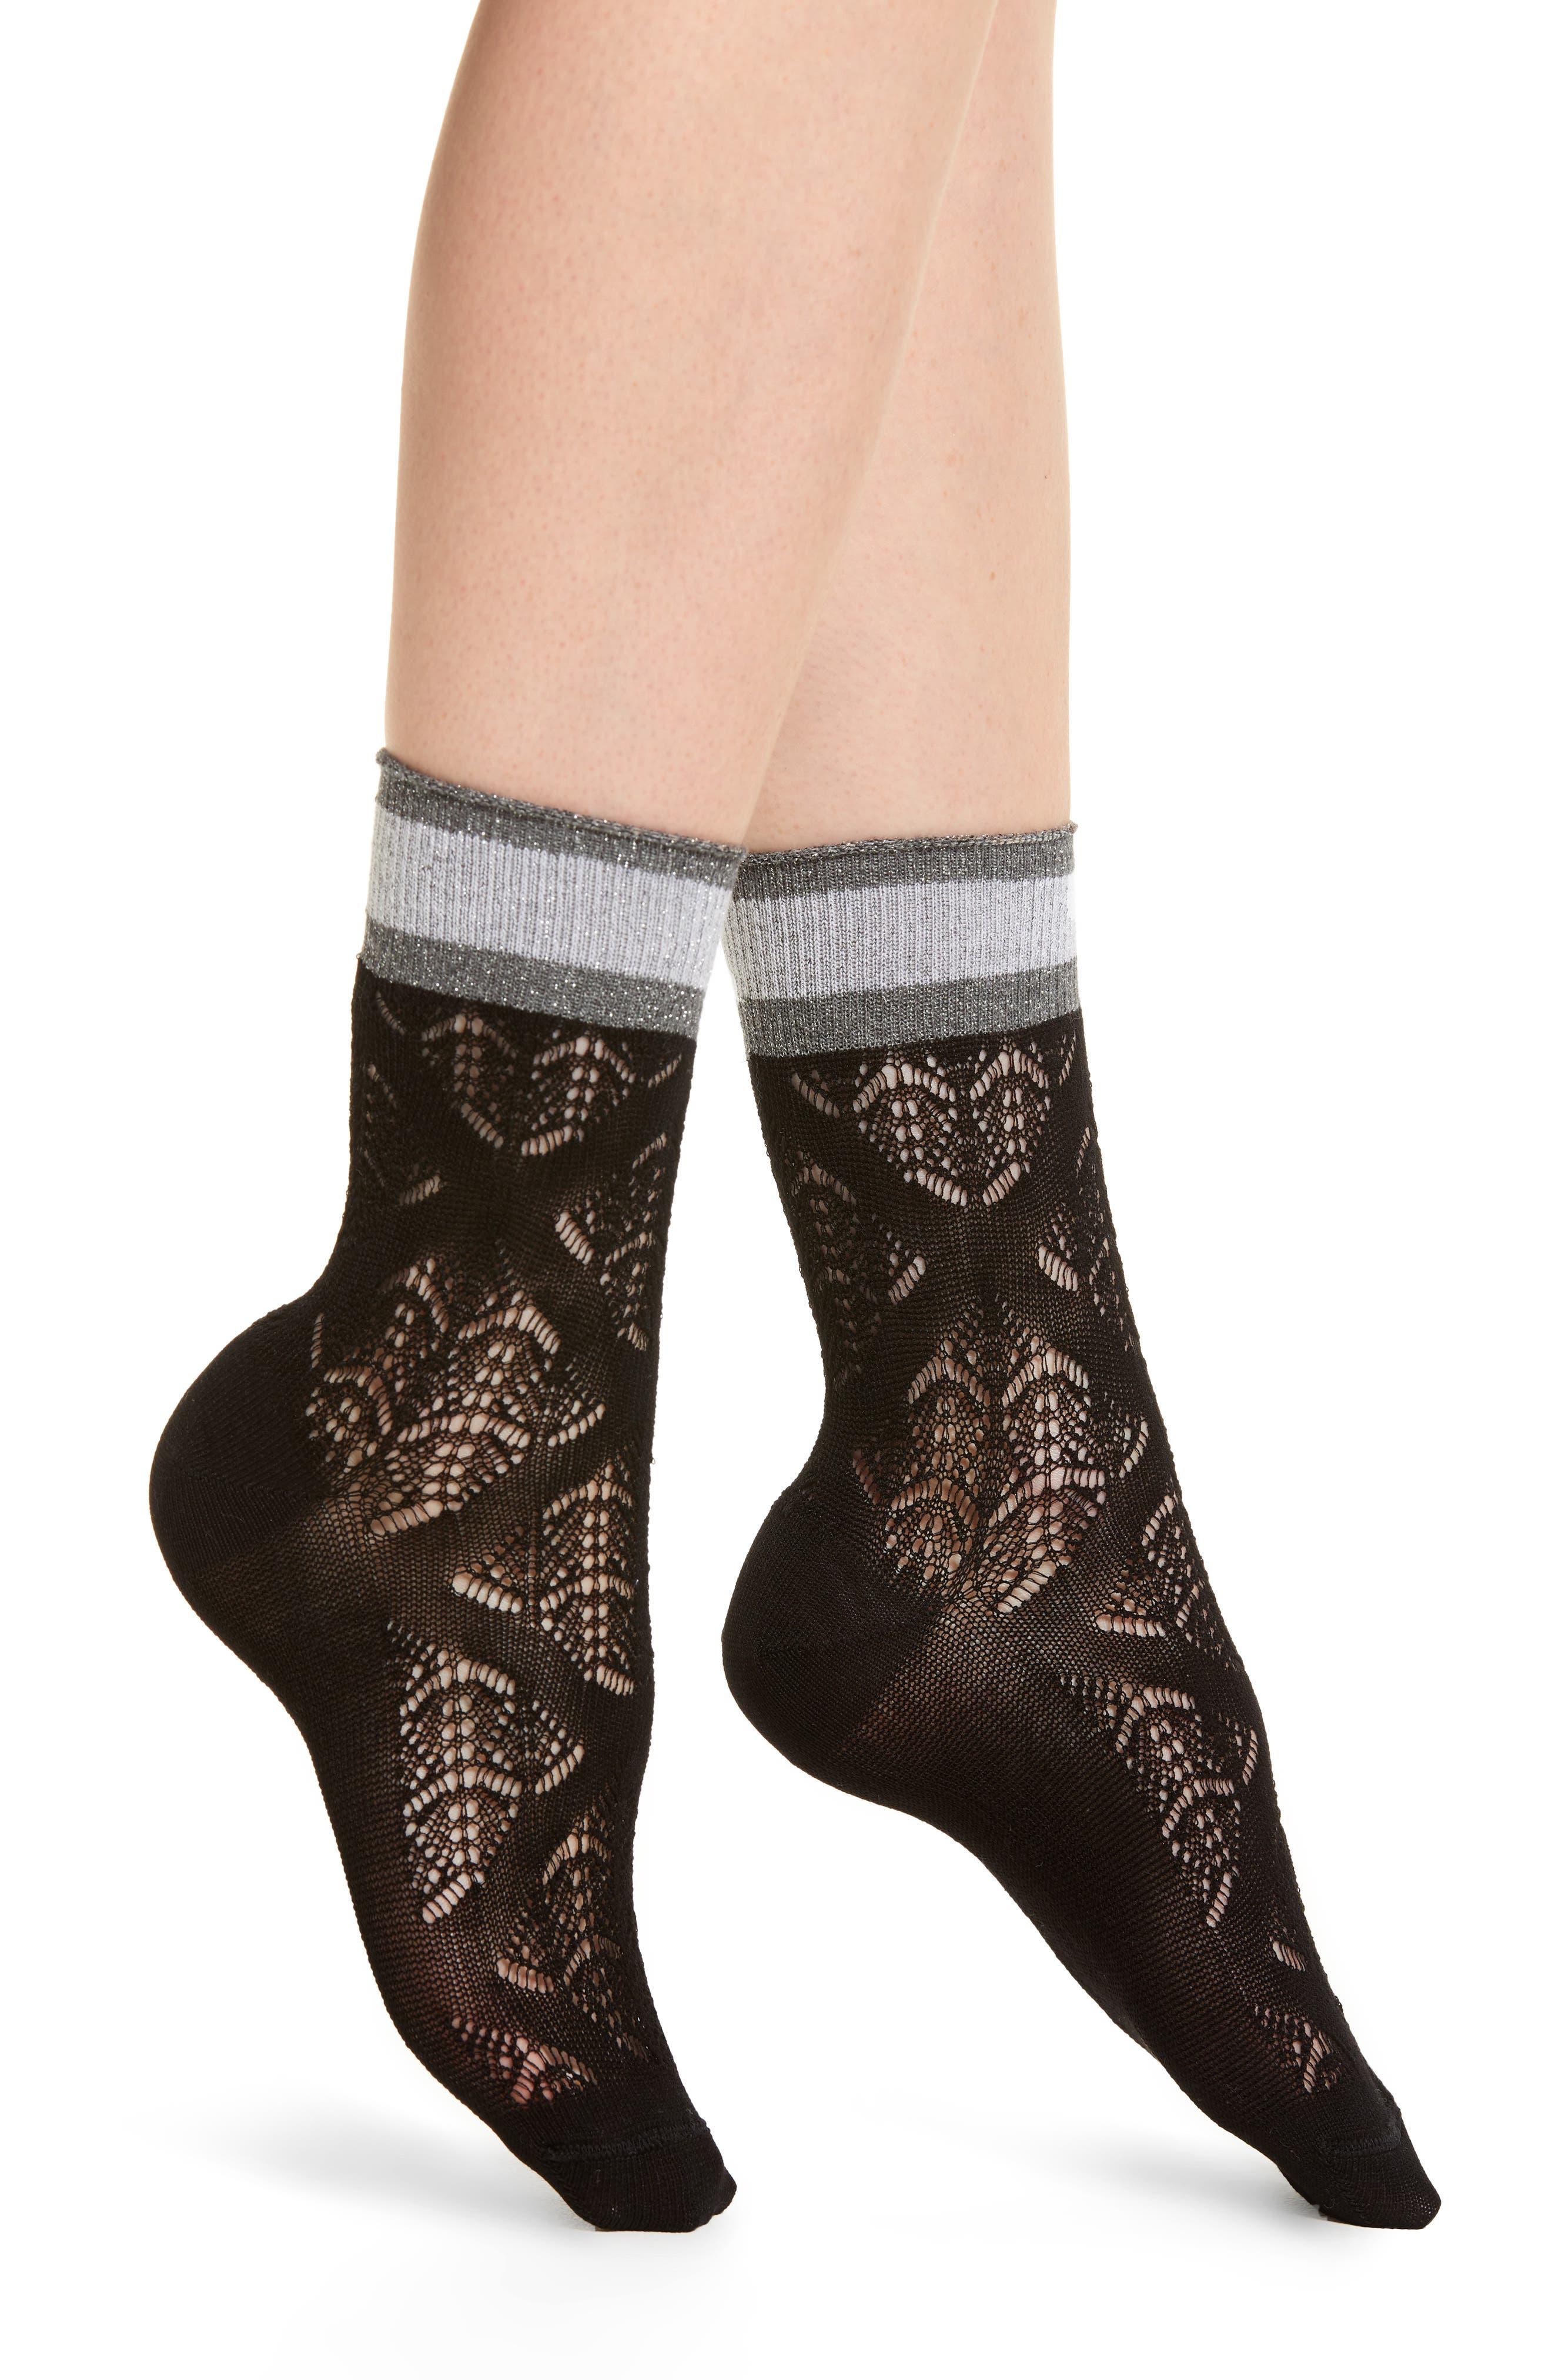 Croquet Trouser Socks,                             Main thumbnail 1, color,                             Black